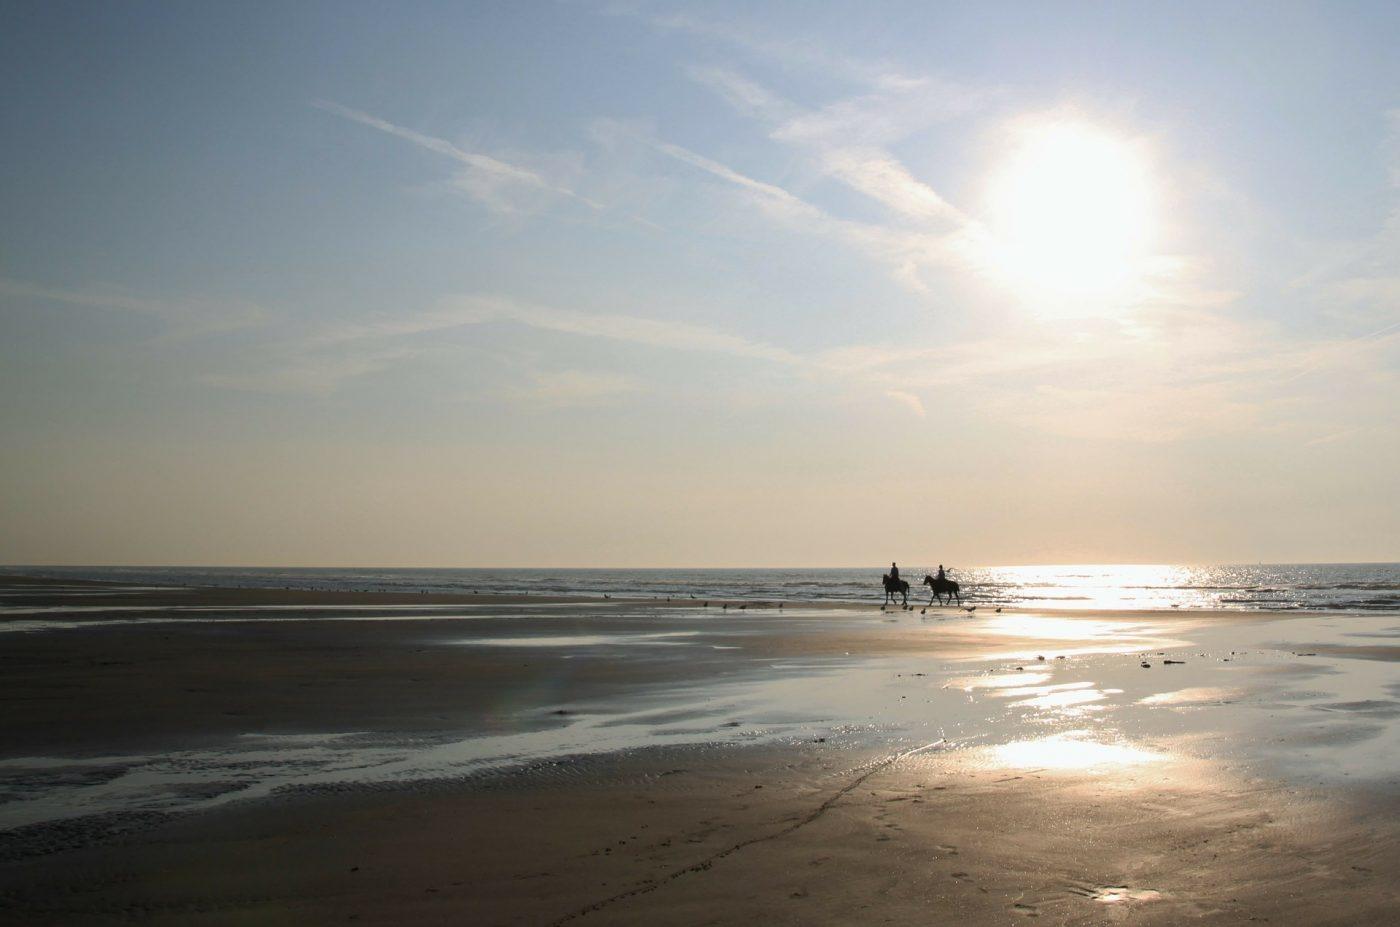 Activities Byron bay: Horseback riding on beach